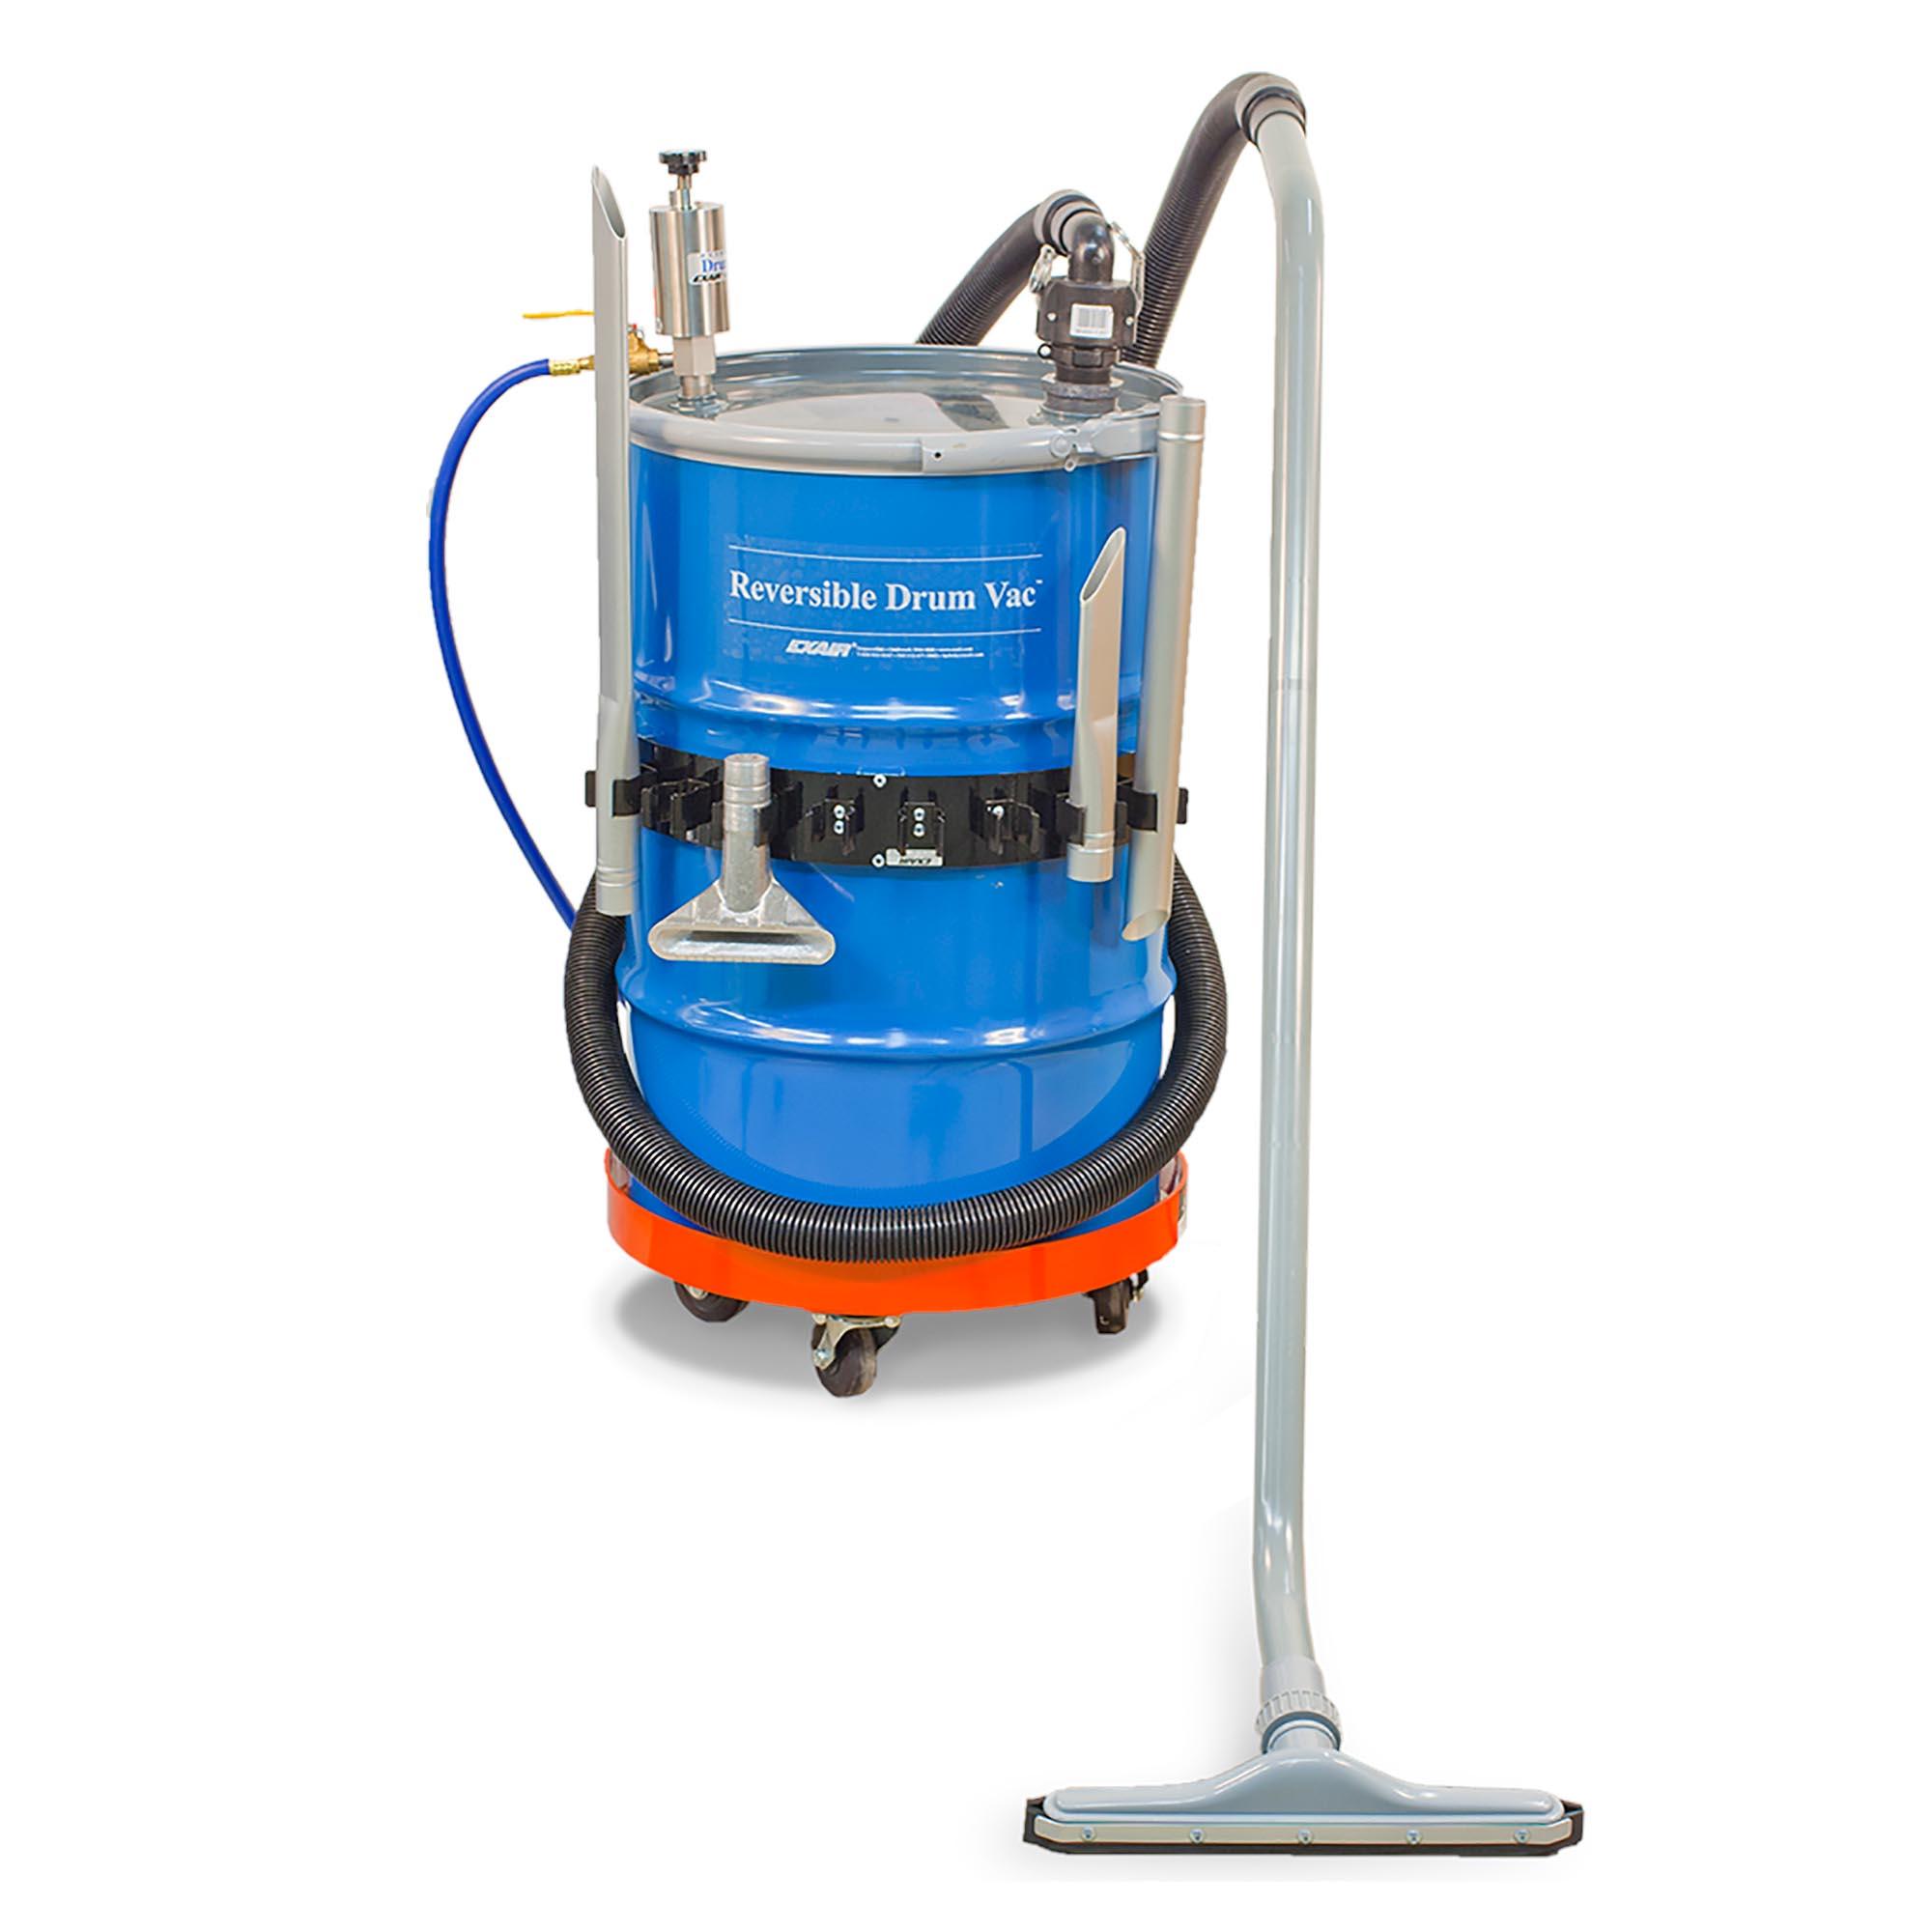 Model 6396-30 30 Gallon Premium Reversible Drum Vac System